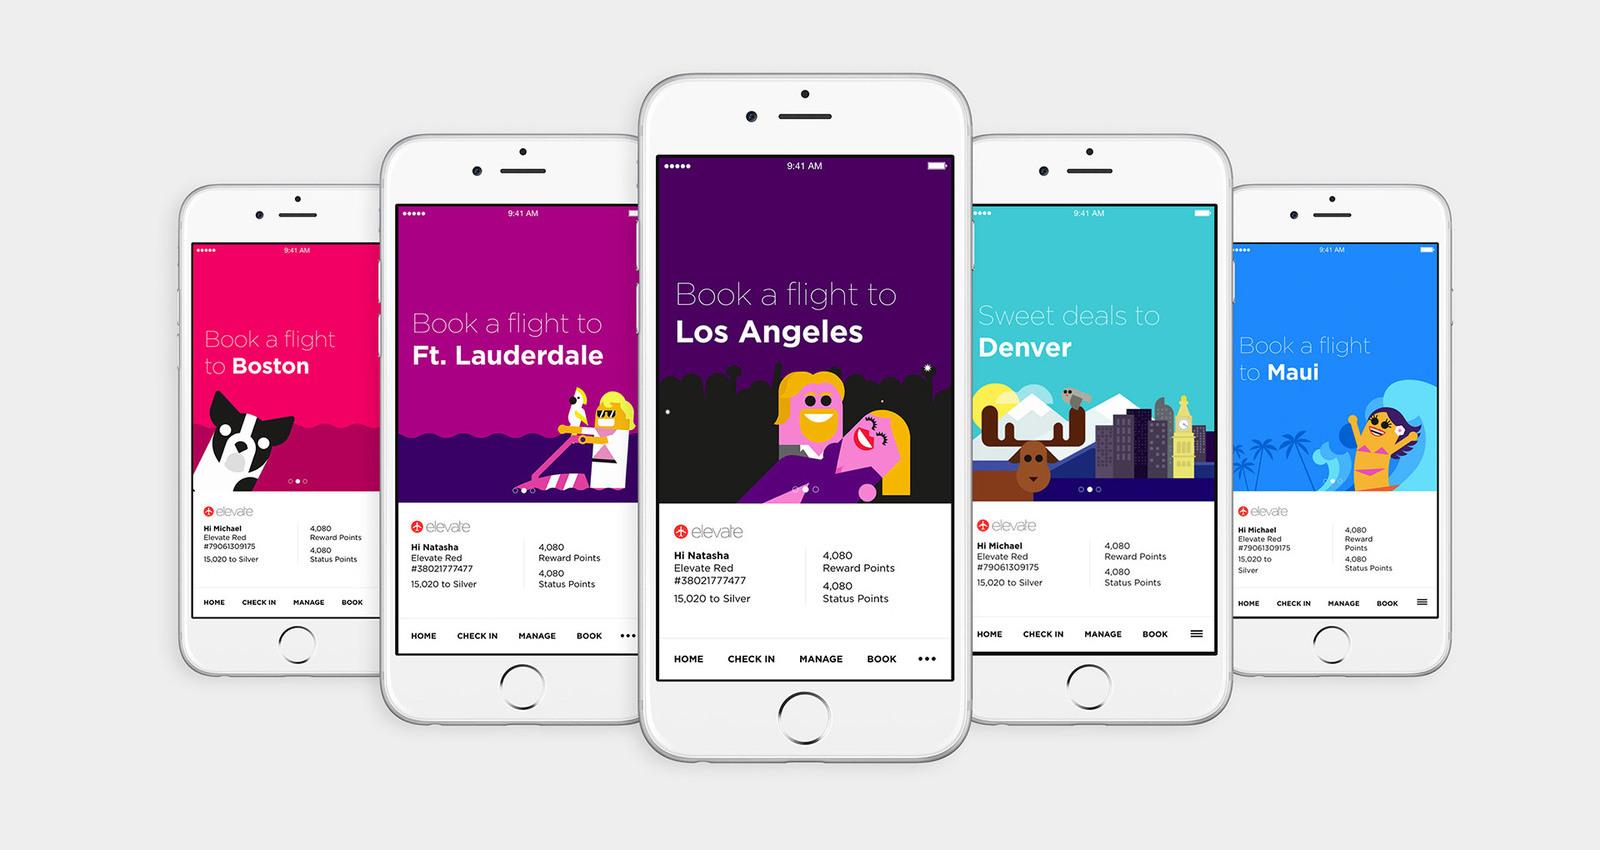 Virgin America's New App